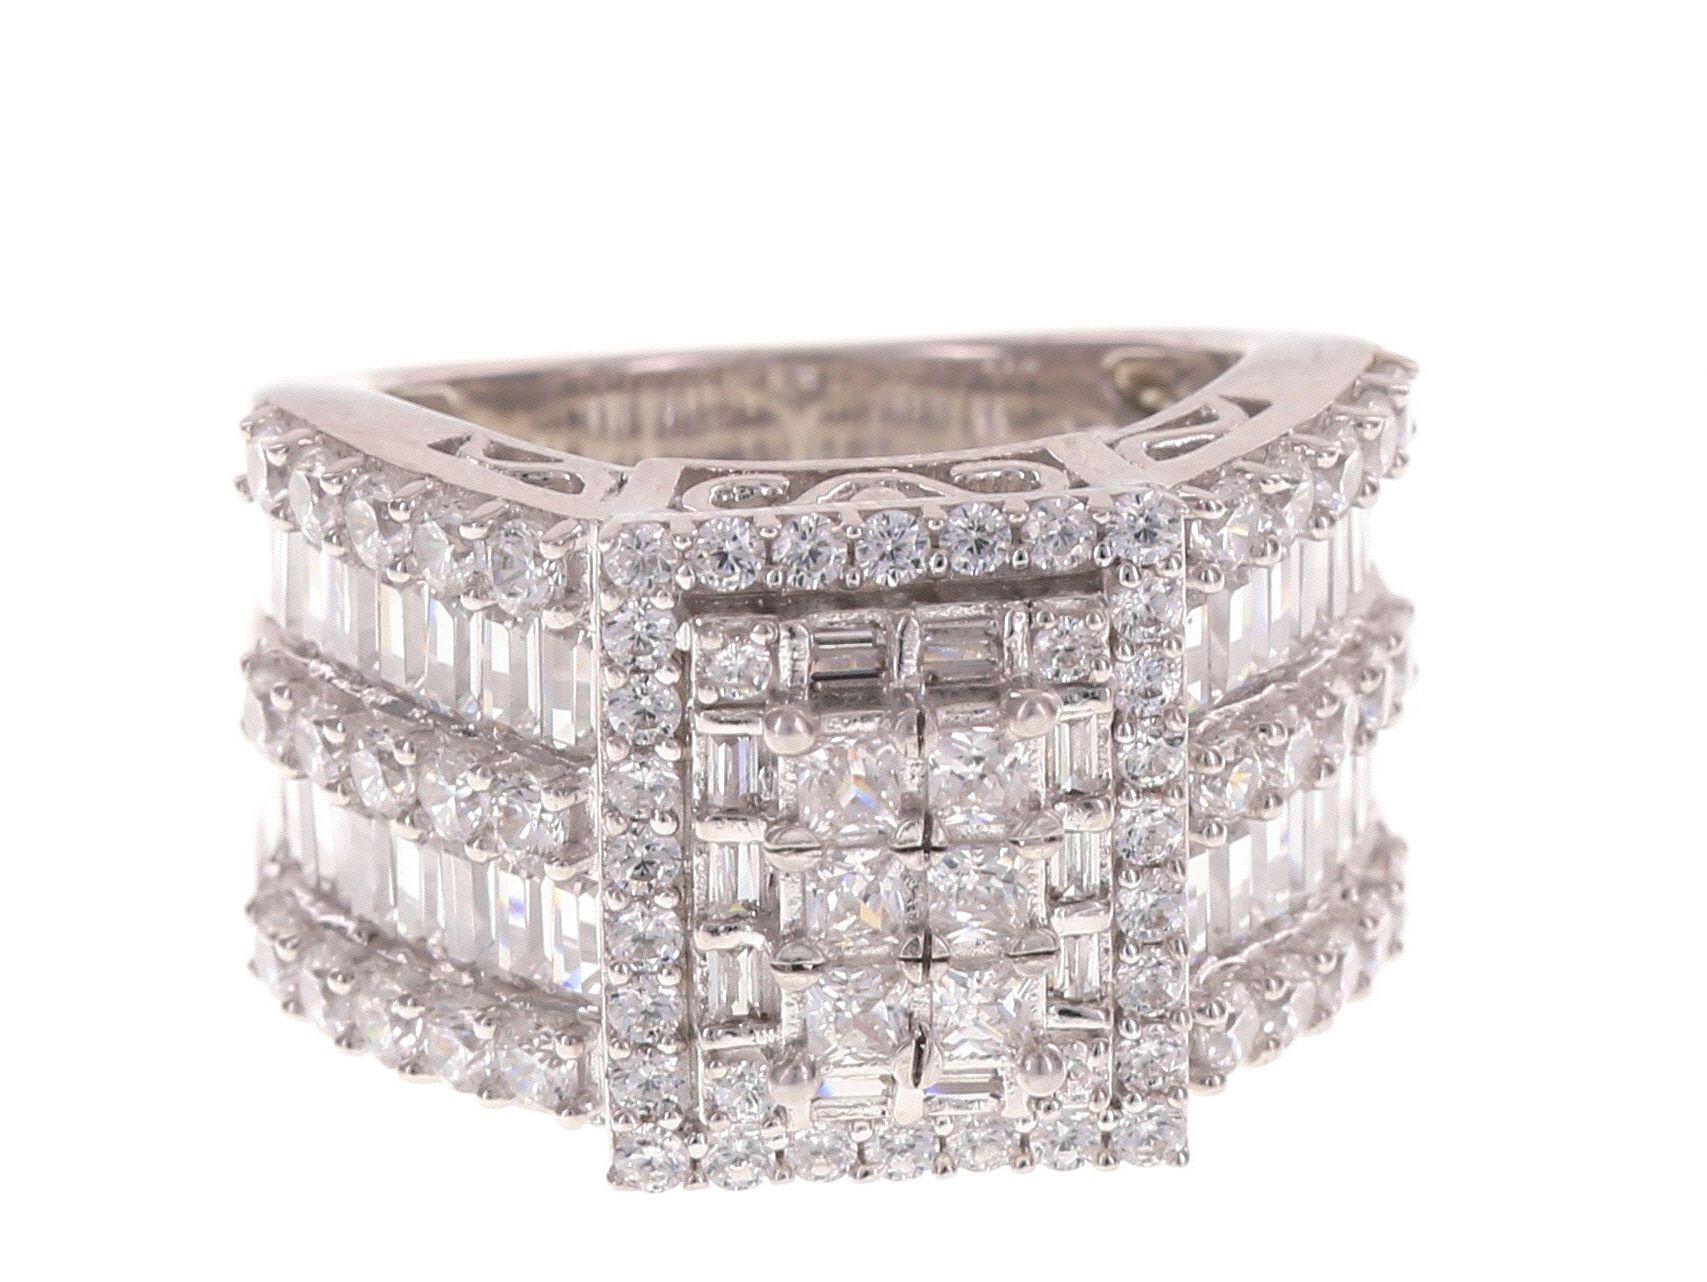 0a440f0799b78 jtv bella luce mens rings | Ring | Morganite ring, Rings, Rings for men